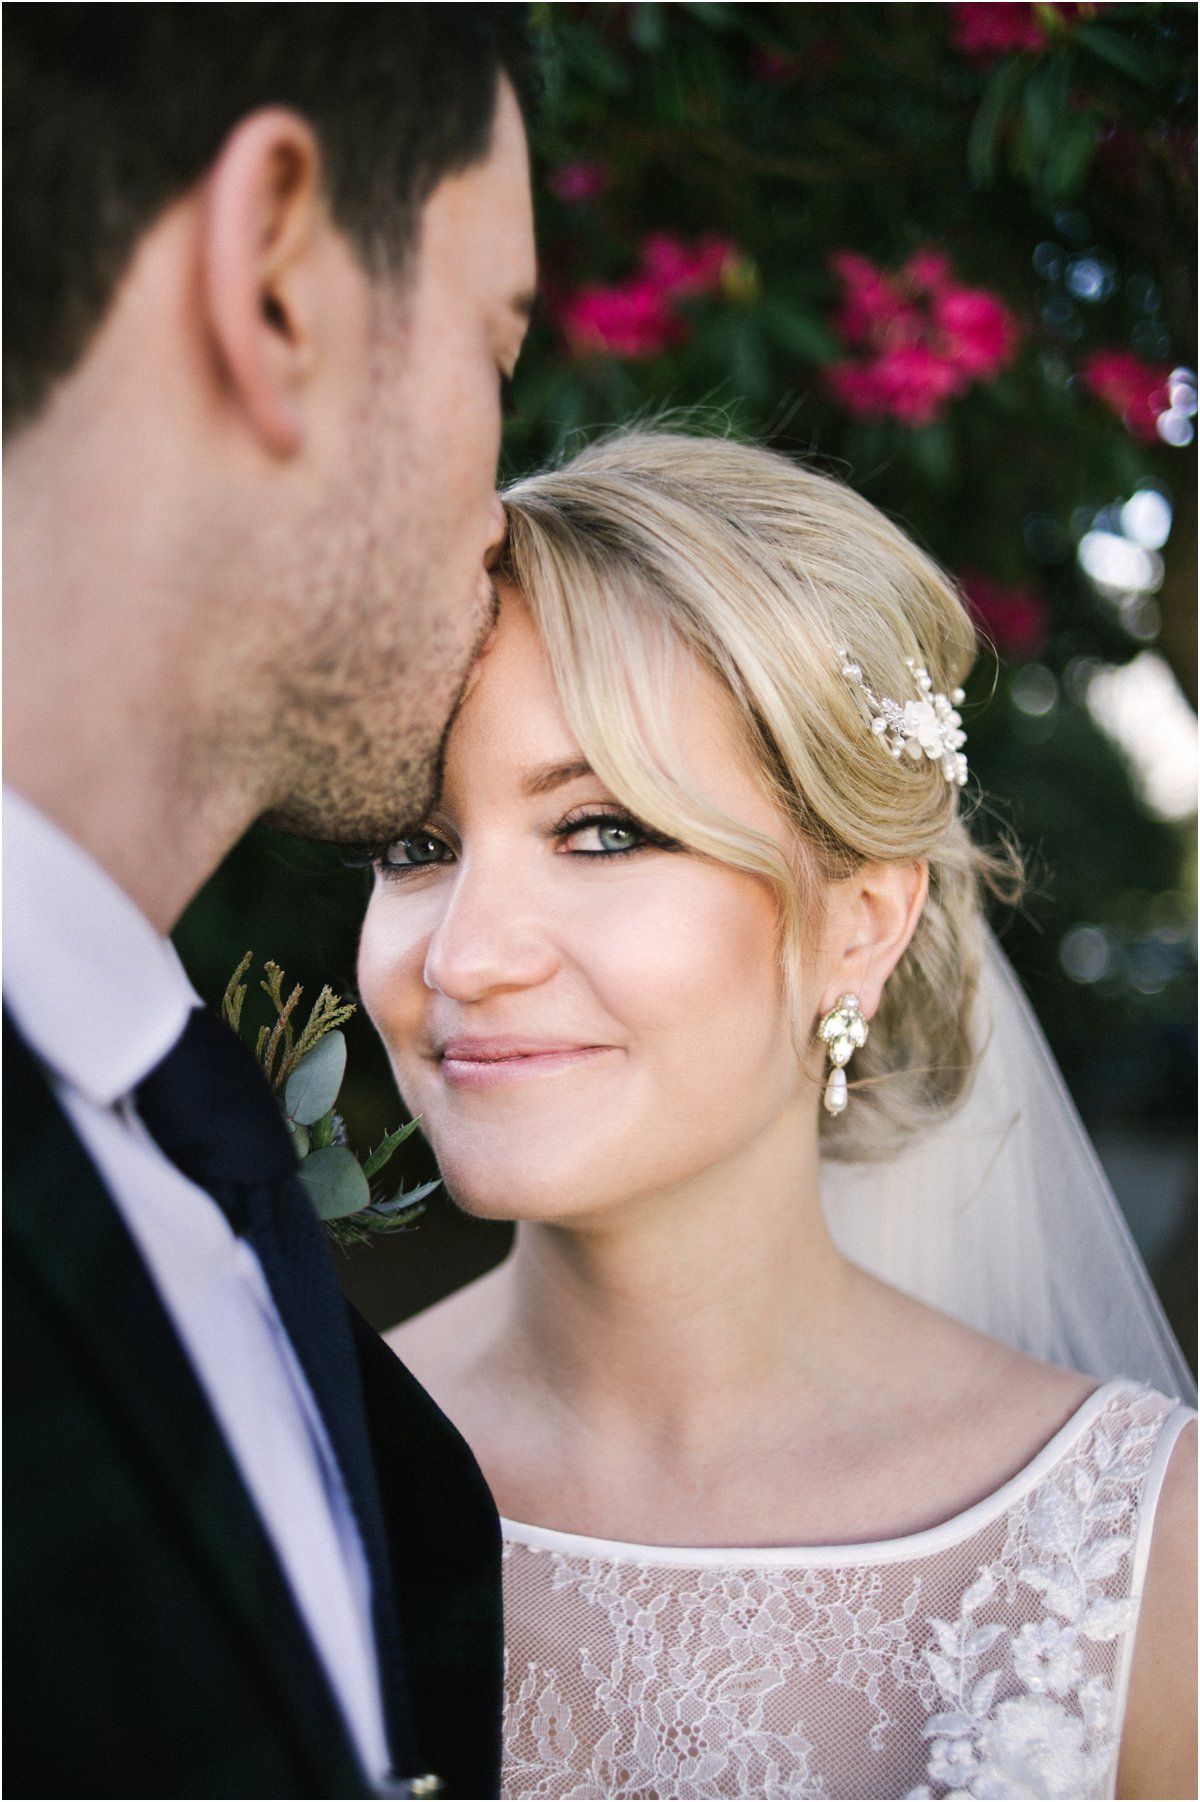 Crofts&Kowalczyk_DundasCastle_WeddingPhotography_Hannah&Tom-76.jpg